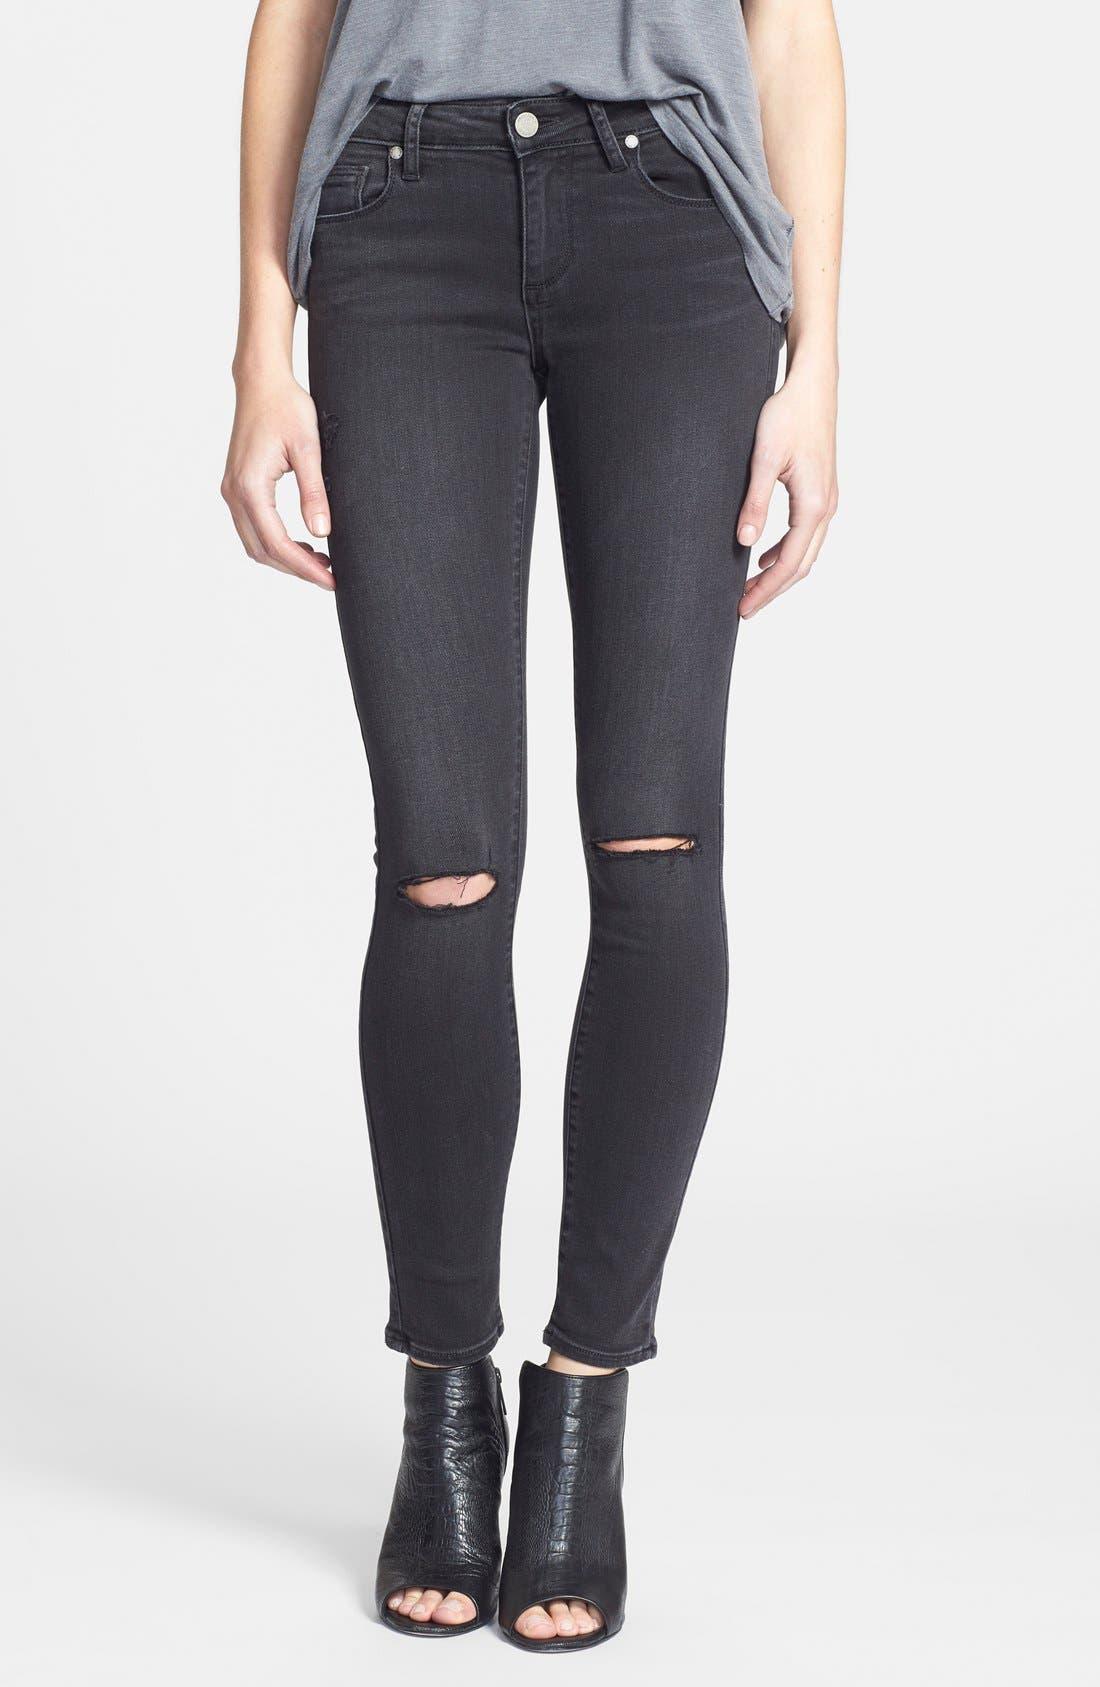 Main Image - Paige Denim 'Verdugo' Ultra Skinny Jeans (Rayed Destructed)